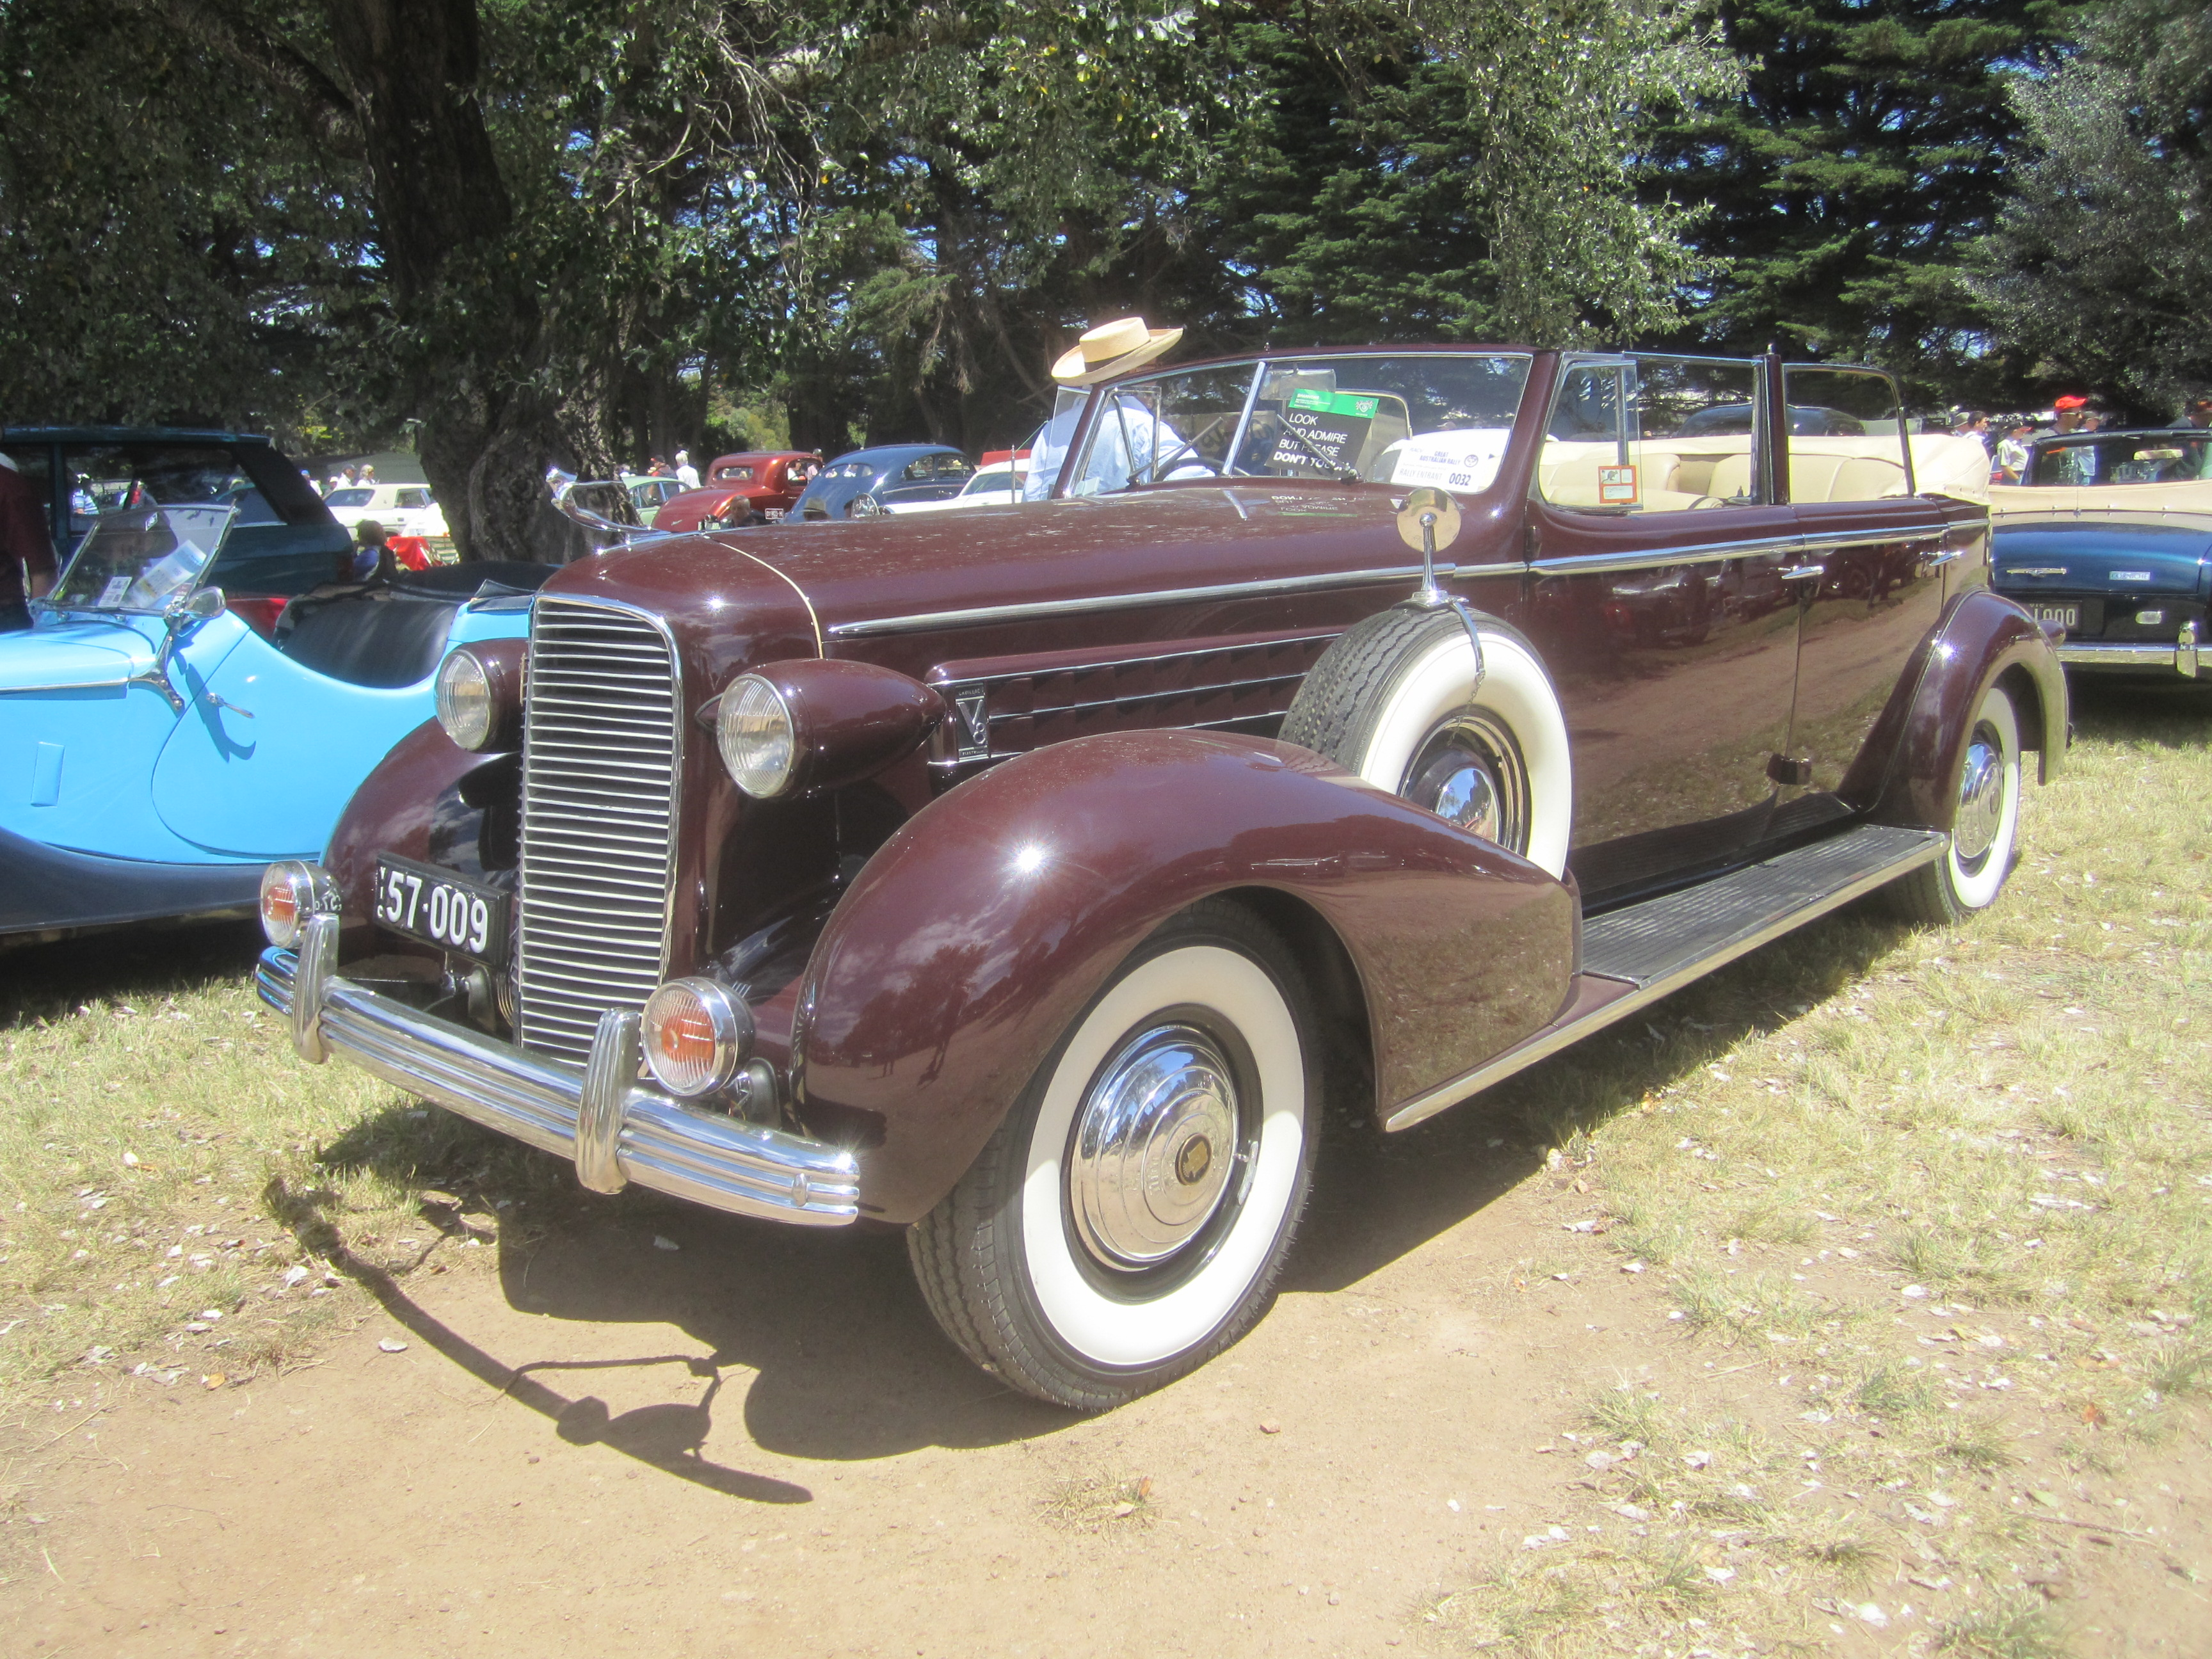 File:1936 Cadillac Series 70 4 door Convertible V8 jpg